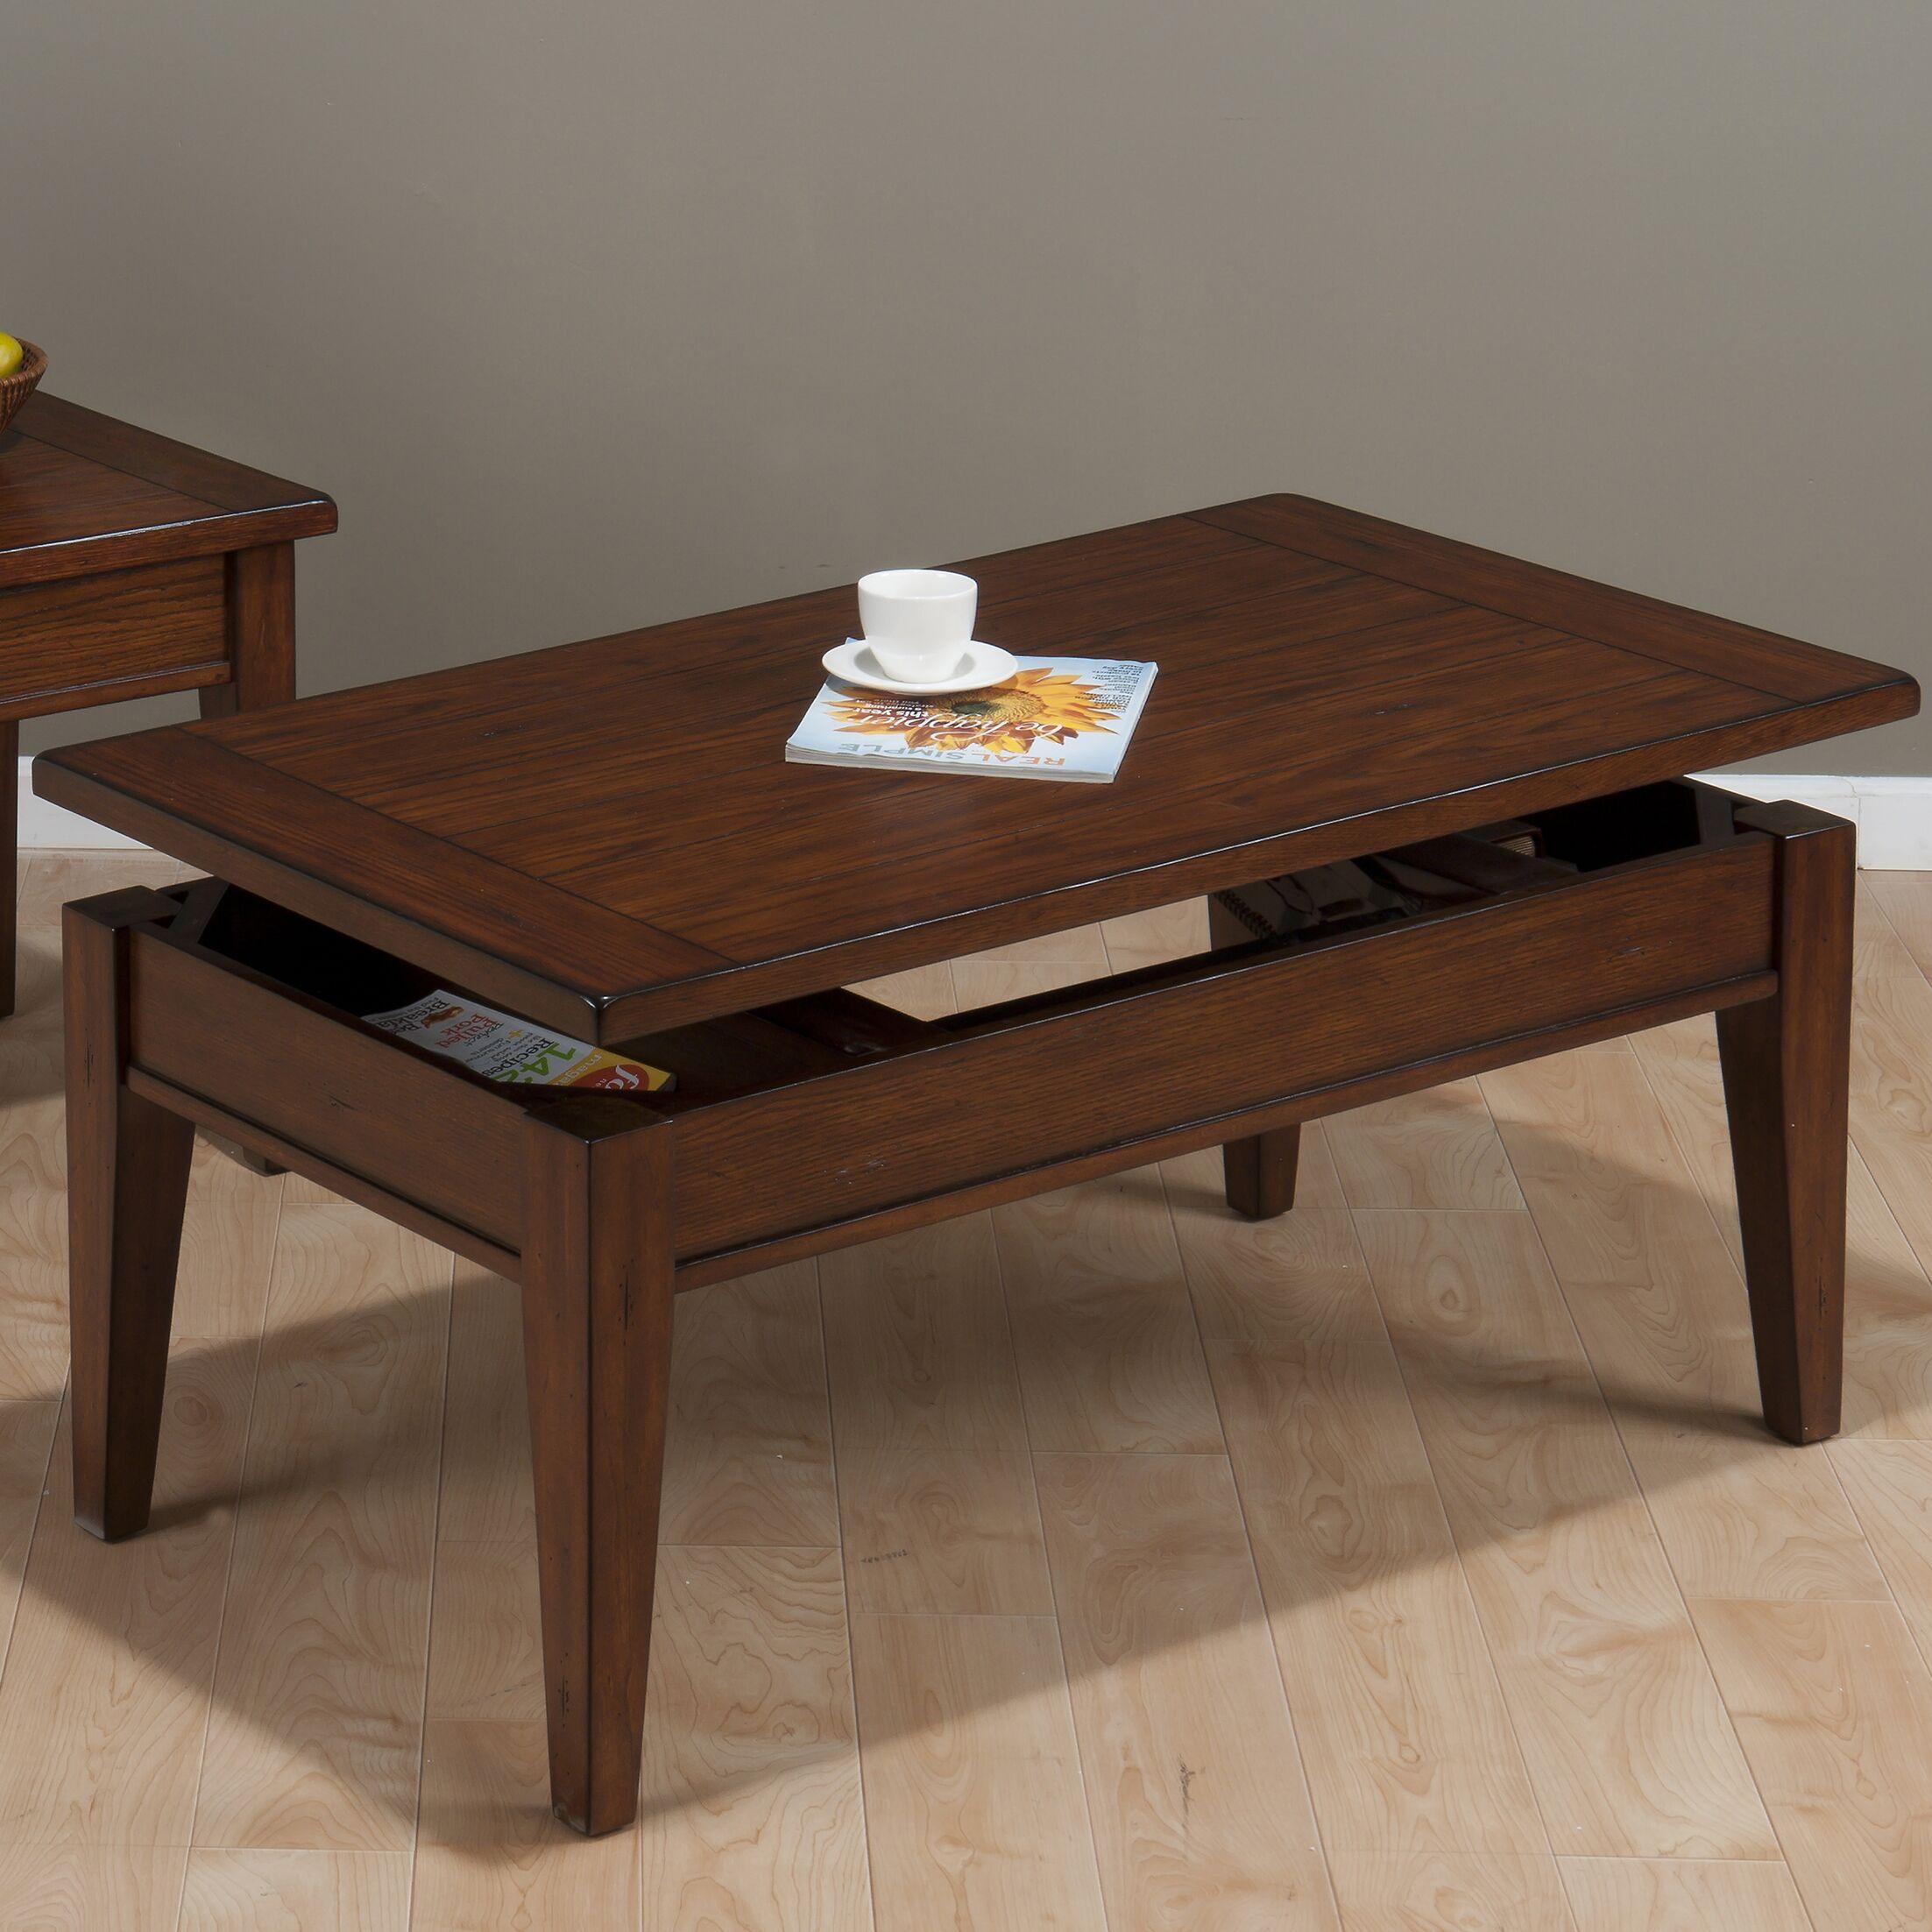 Dunbar Lift Top Coffee Table